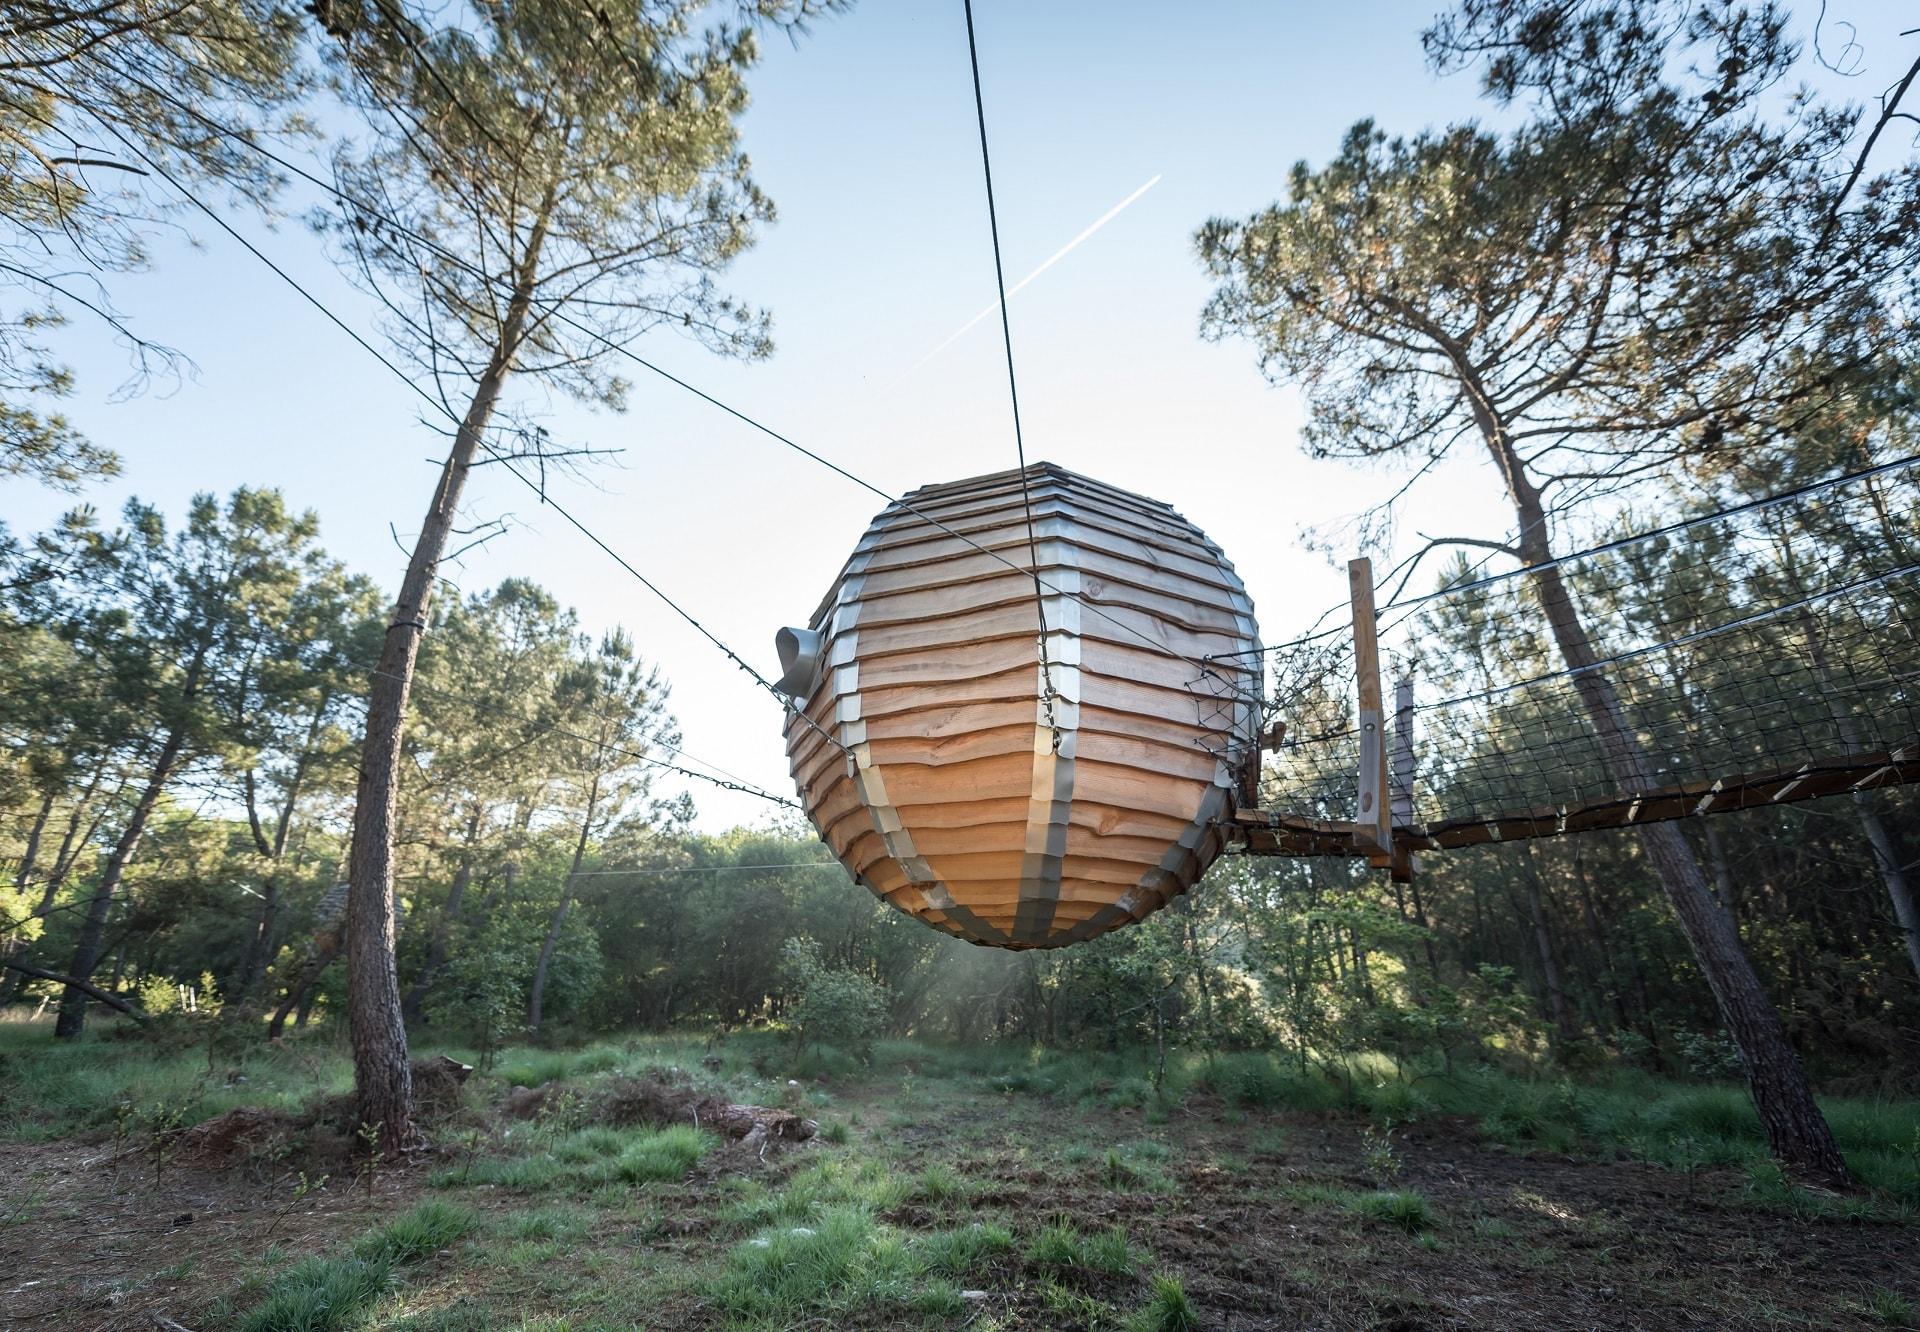 location de nid perch bretagne lov 39 nid dans les arbres. Black Bedroom Furniture Sets. Home Design Ideas